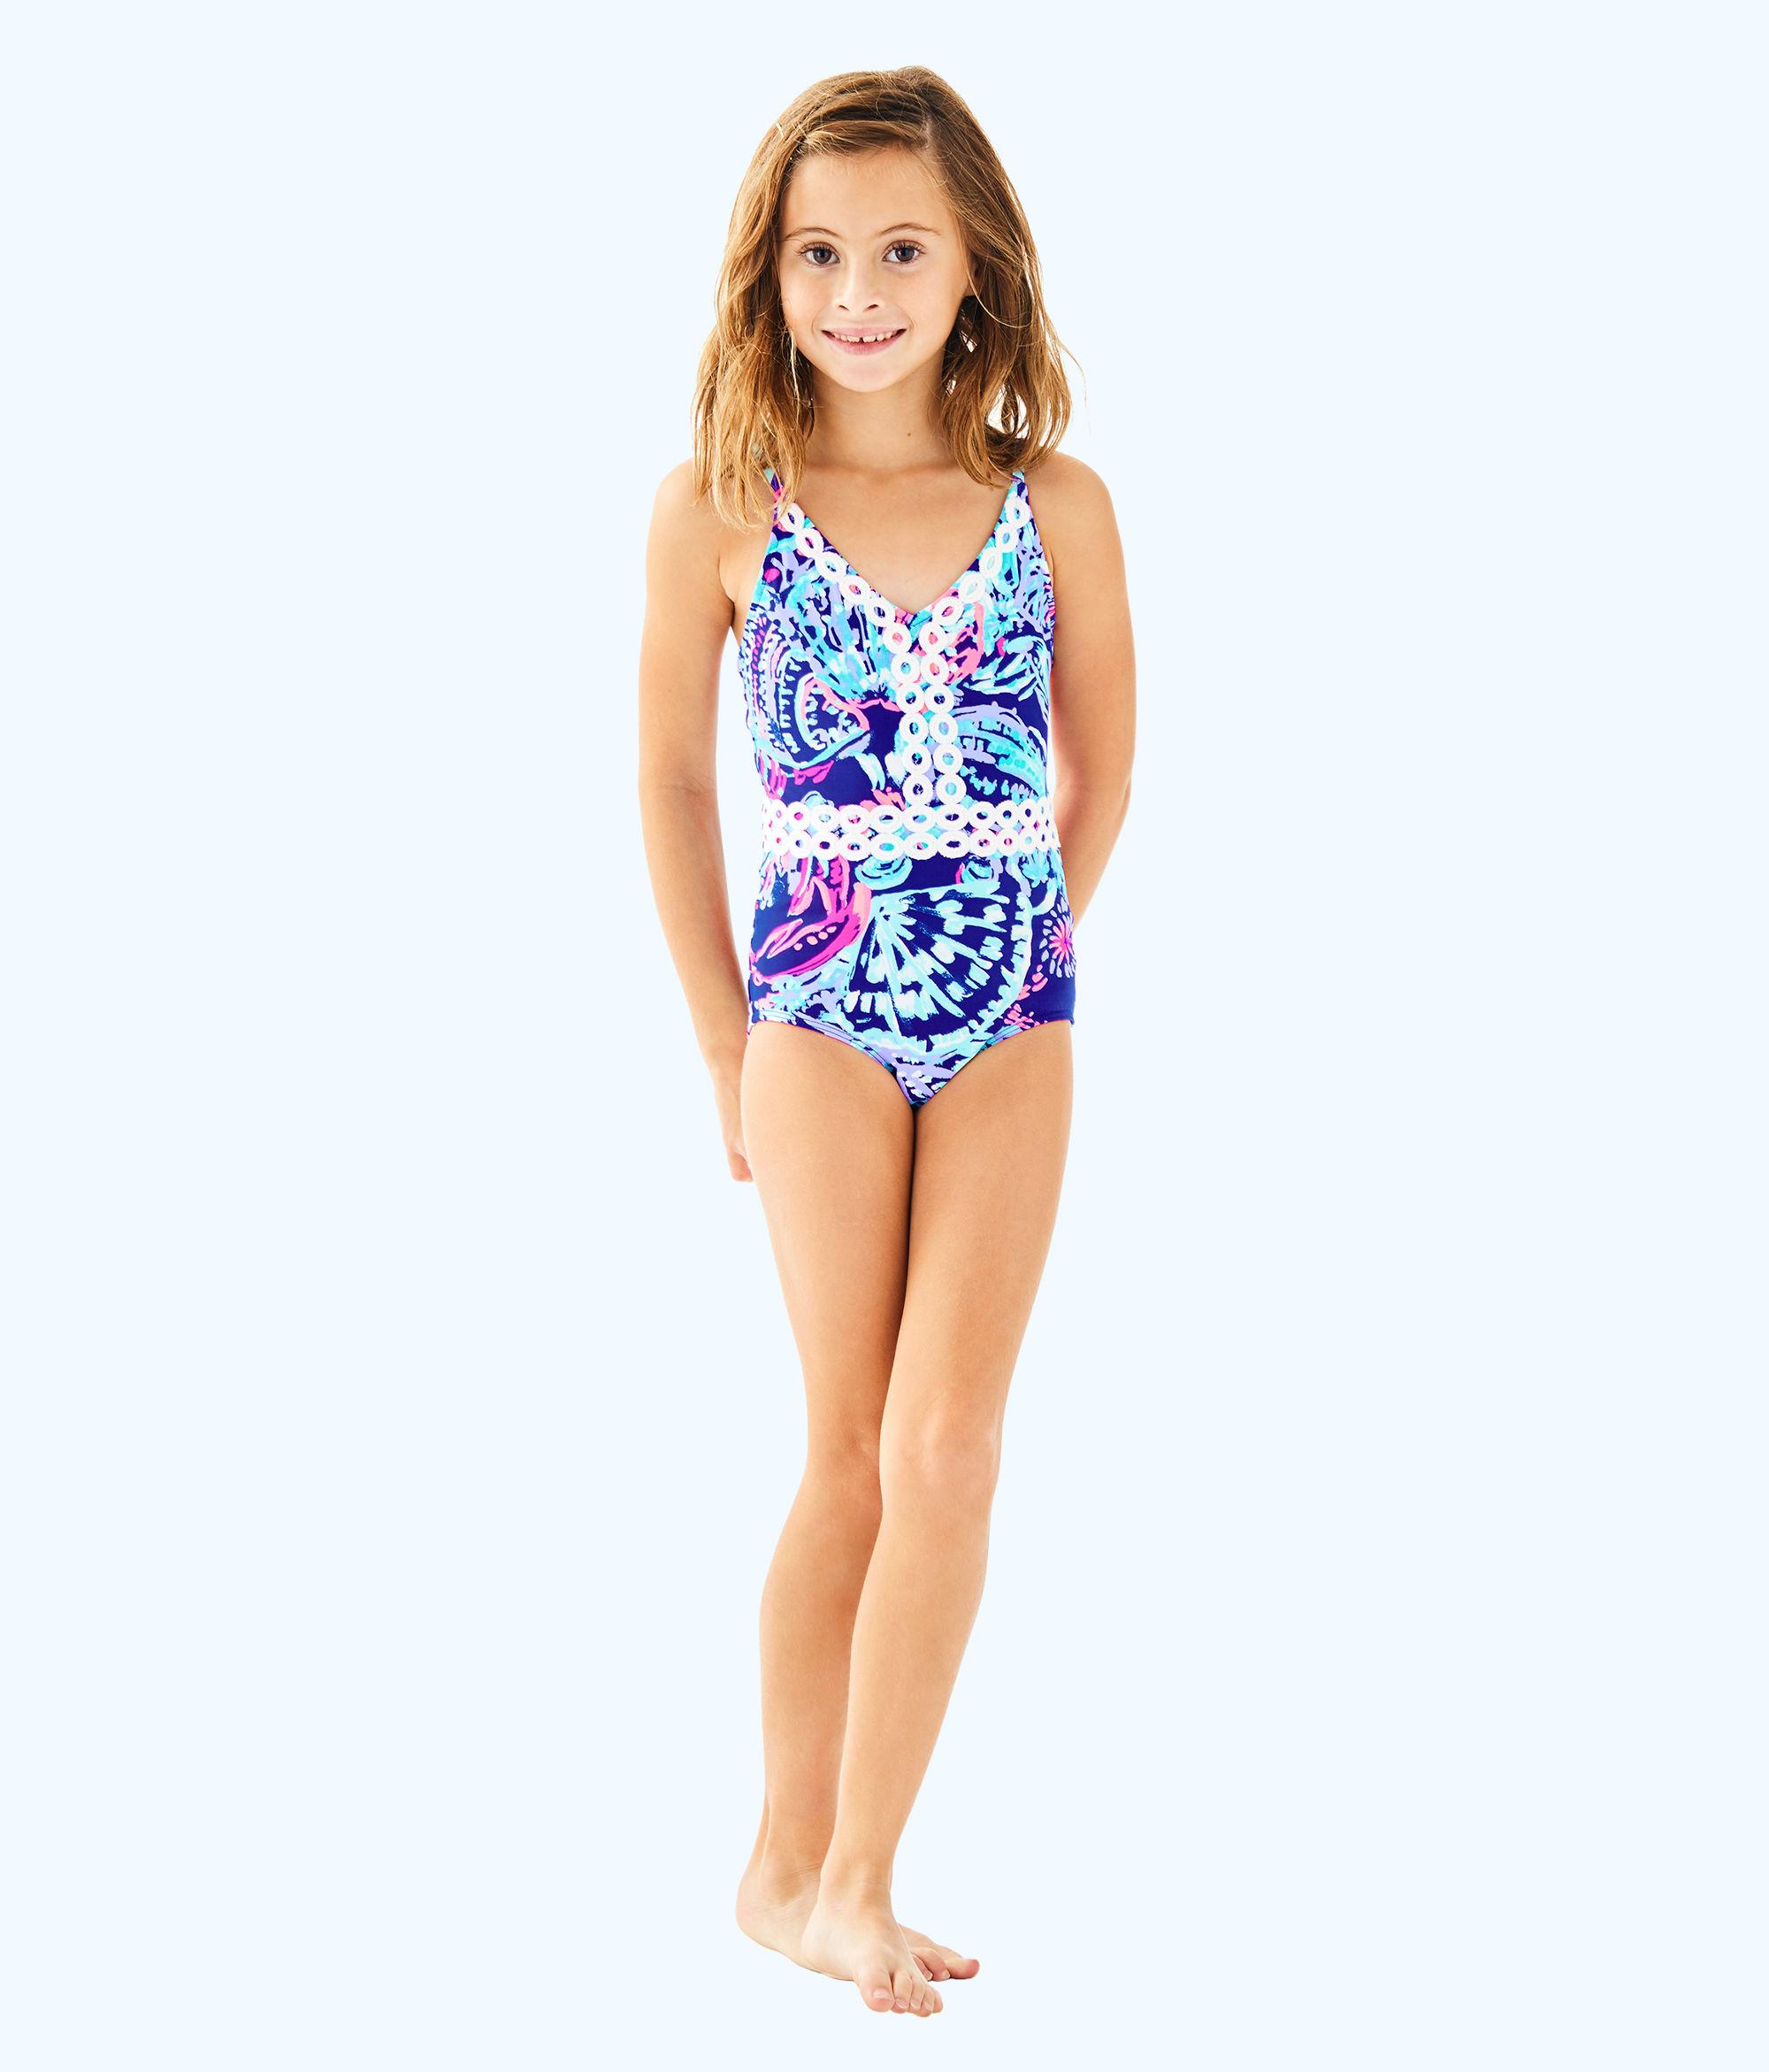 f6914458bfbb1 10 Mom   Me Swimwear Brands to Shop This Season - Show Your Shells